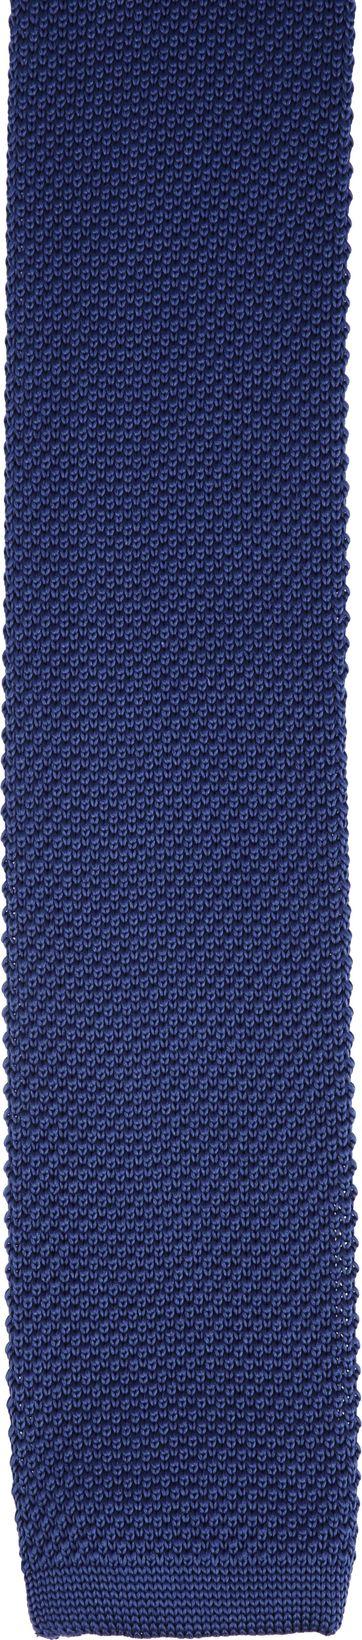 Suitable Knitted Krawatte Dunkeblau